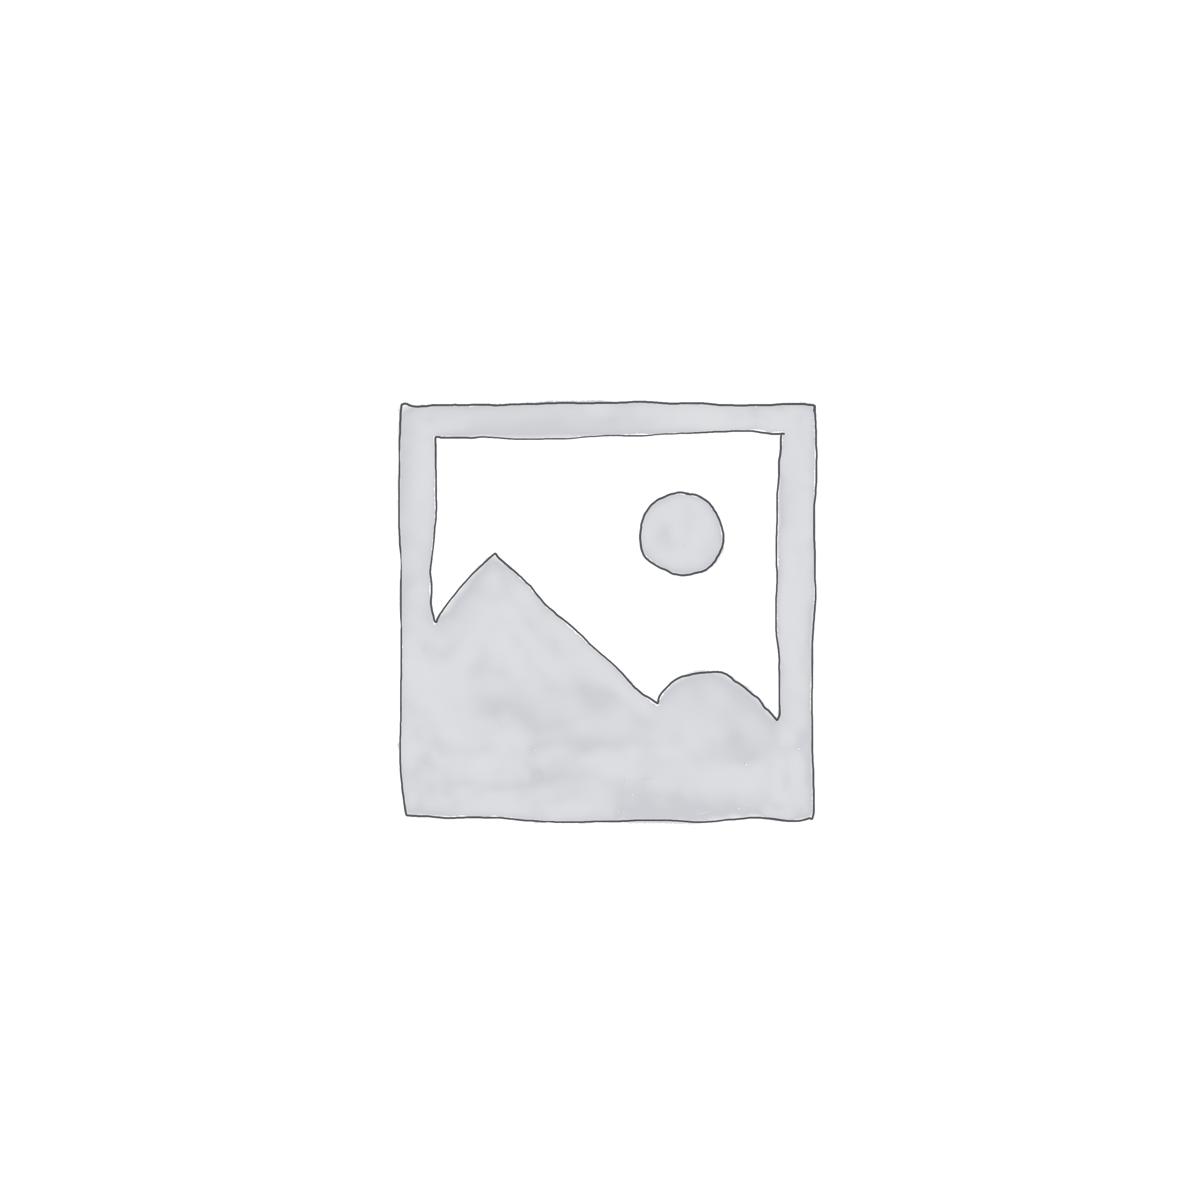 Colorful Flower Bouqet Wallpaper Mural